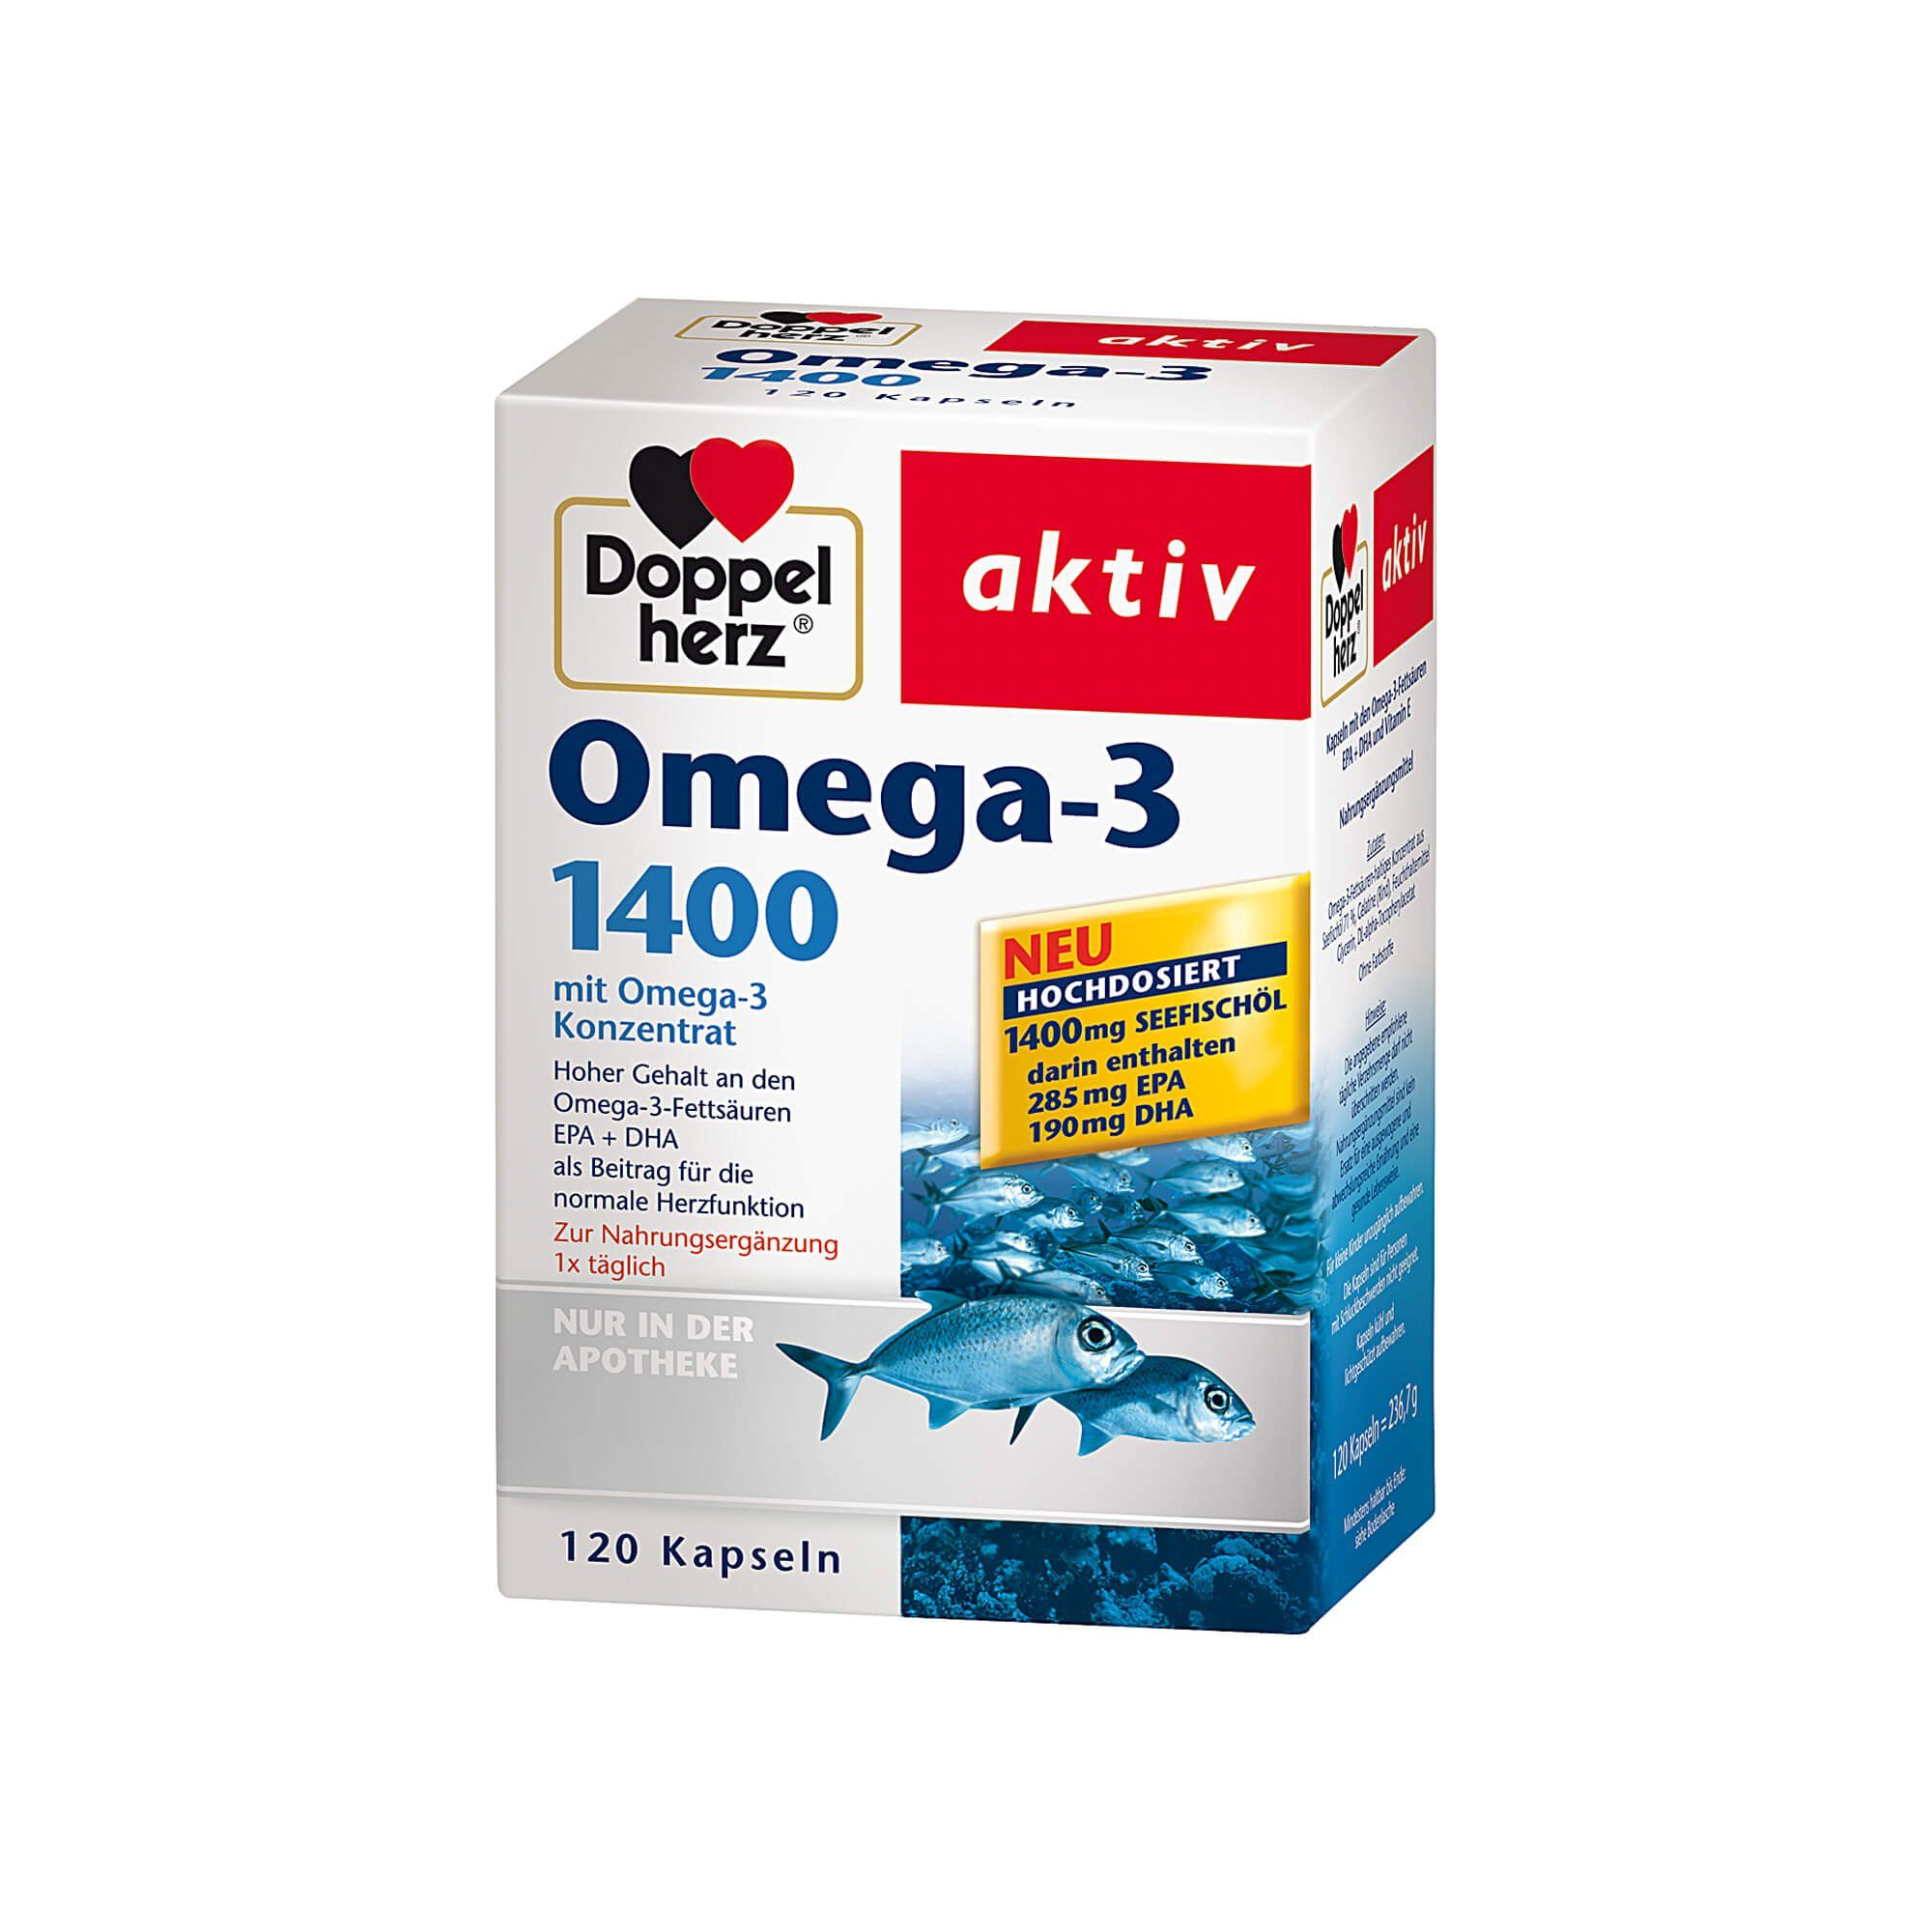 Doppelherz Omega-3 1.400 Kapseln (, 120 St)